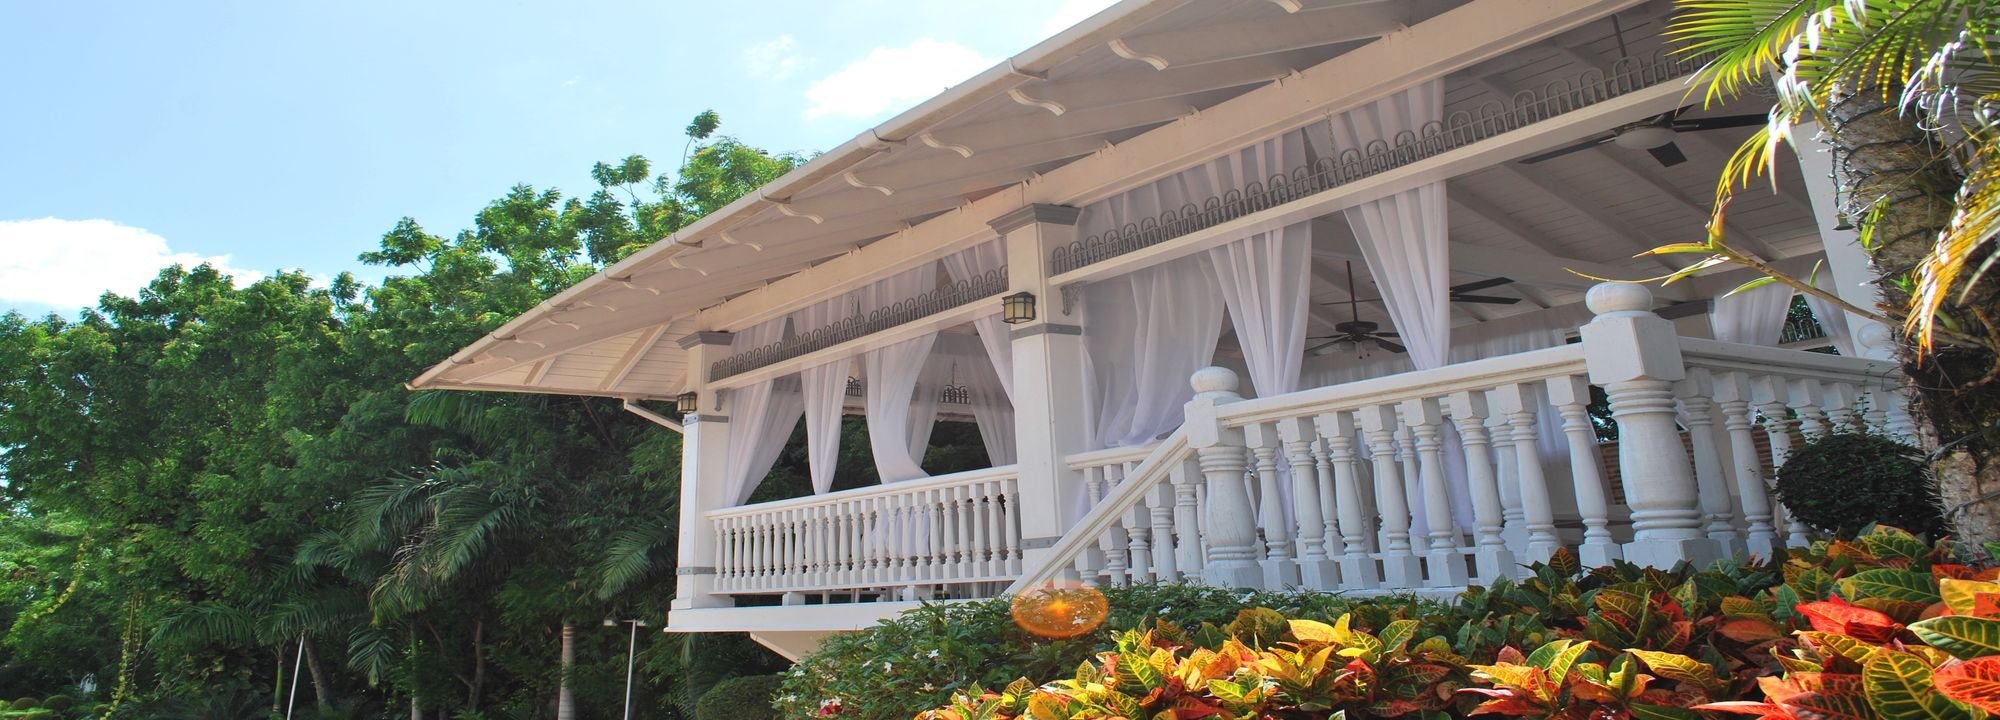 Hotel Platino Terrace Santiago Dominican Republic